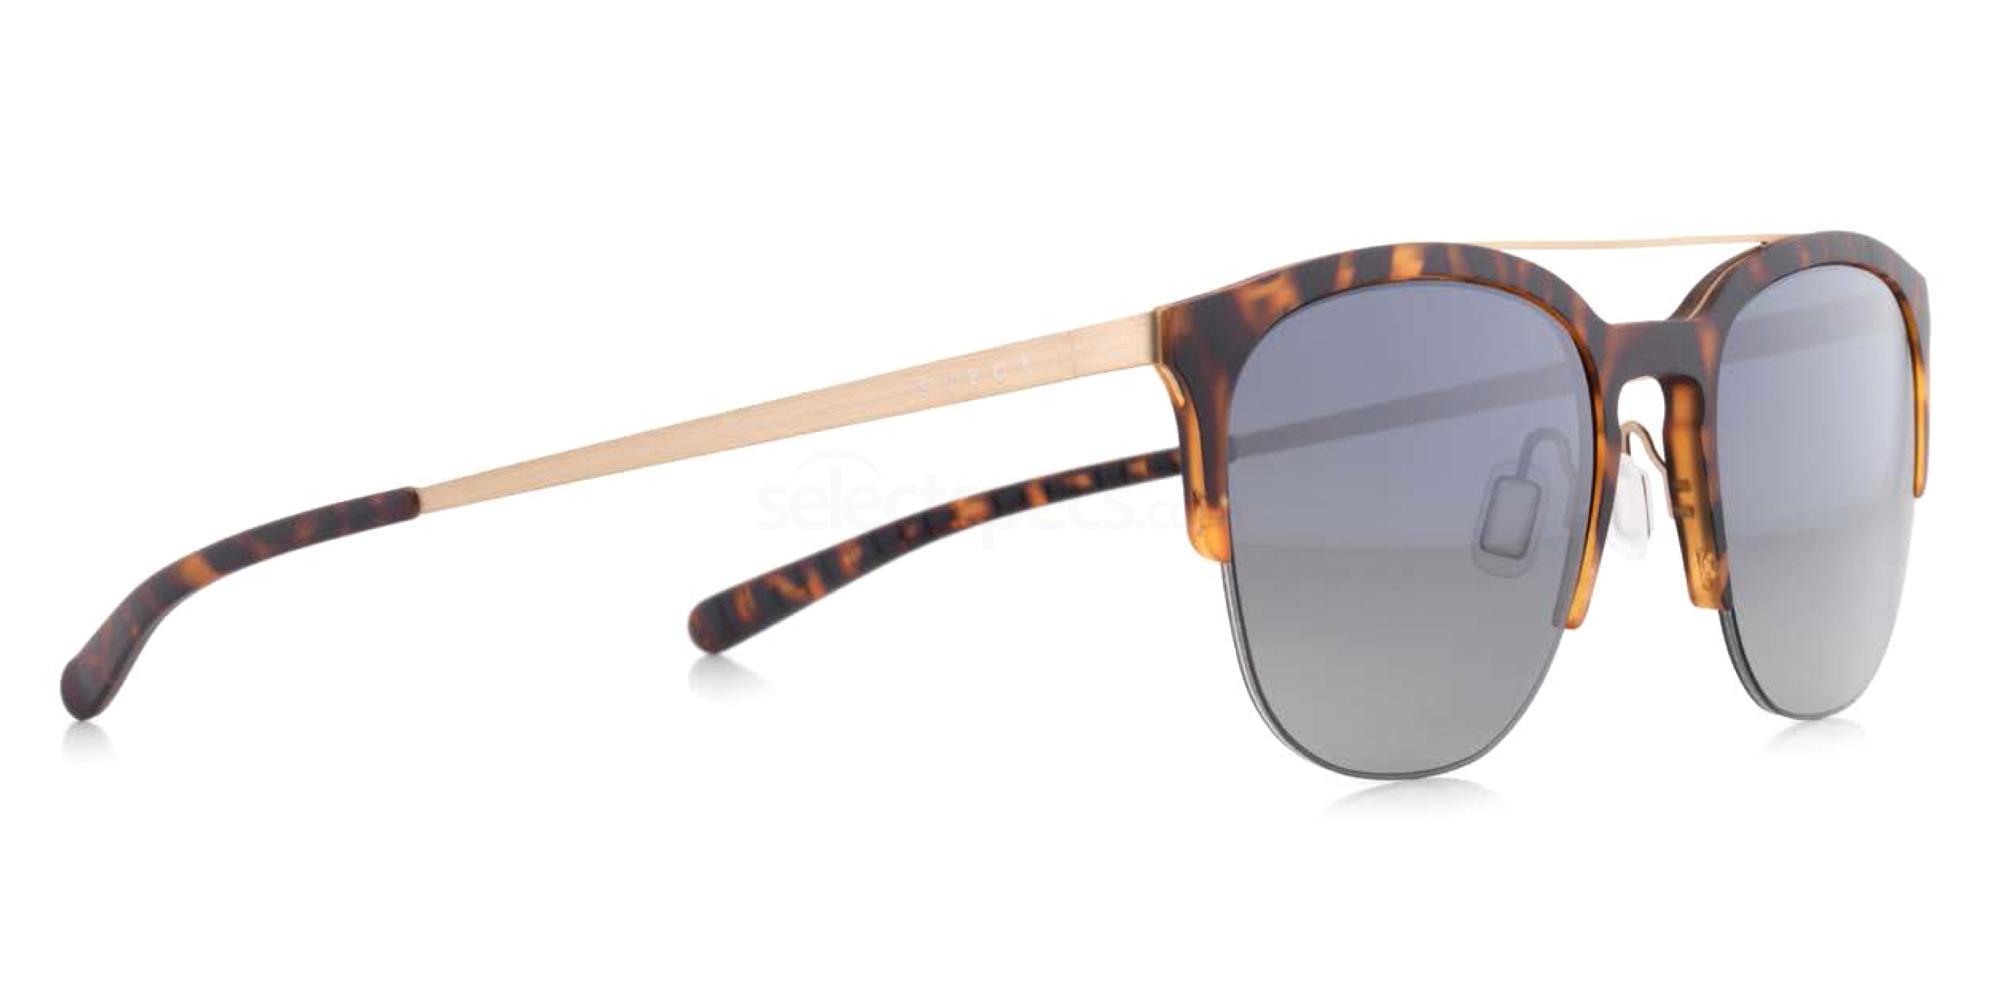 001P SOHO Sunglasses, SPECT